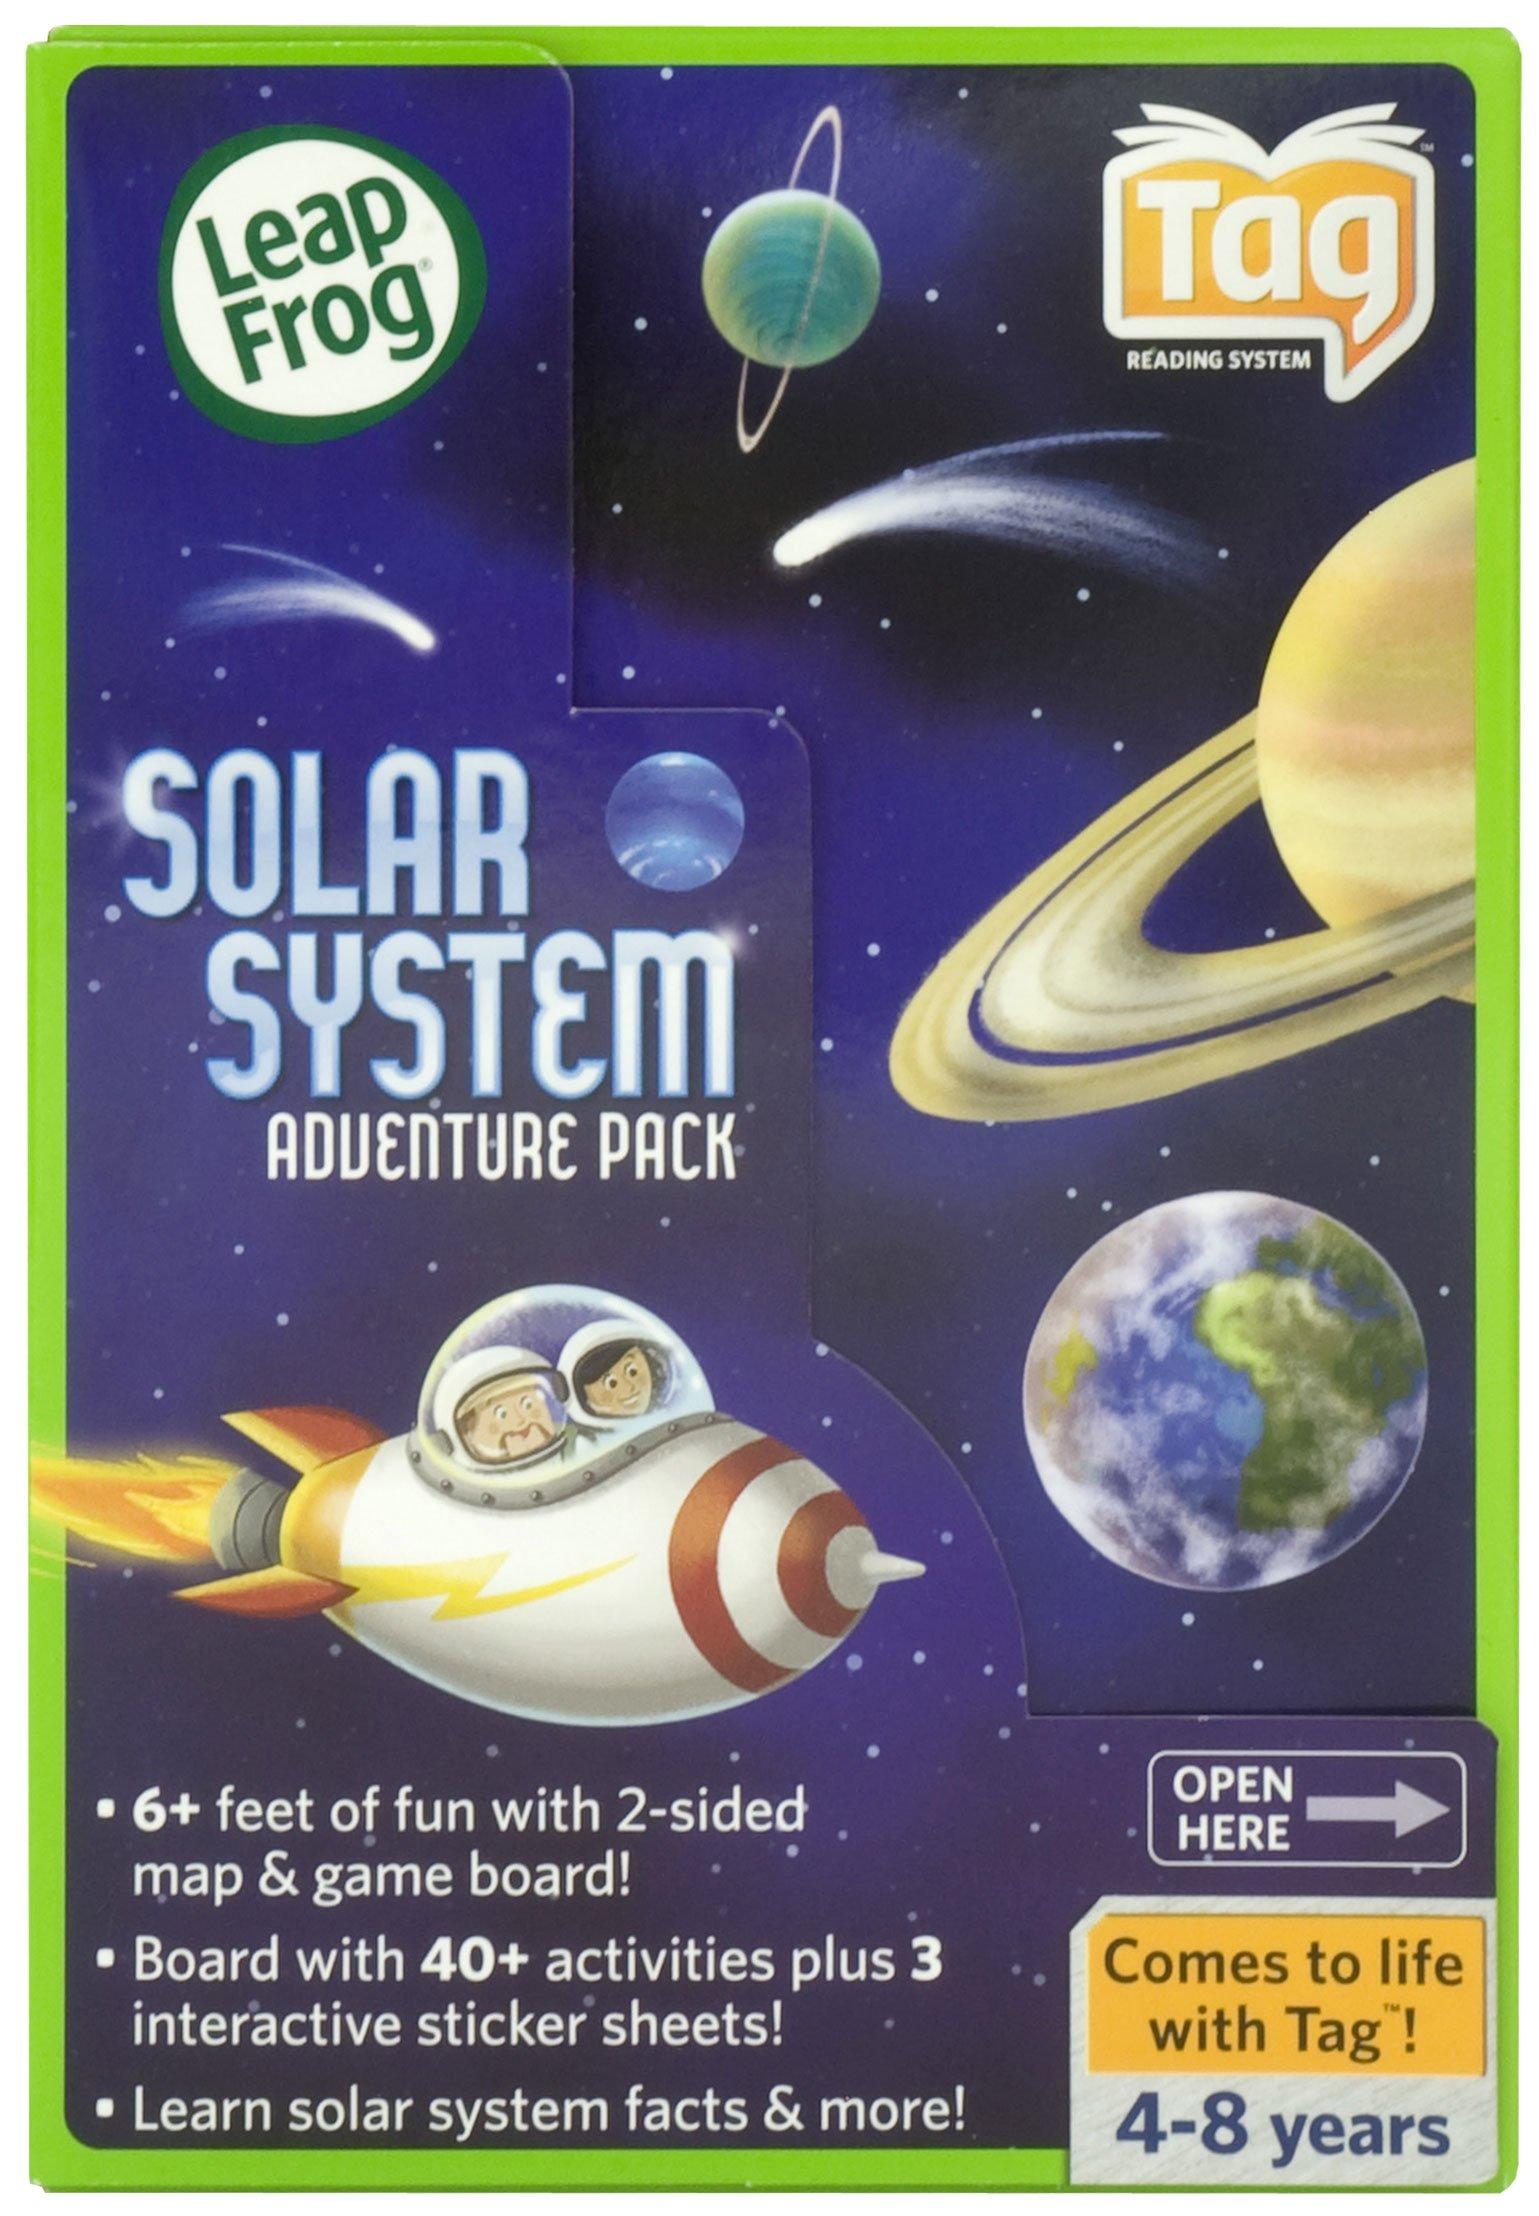 LeapFrog Tag Solar System Adventure Pack by LeapFrog